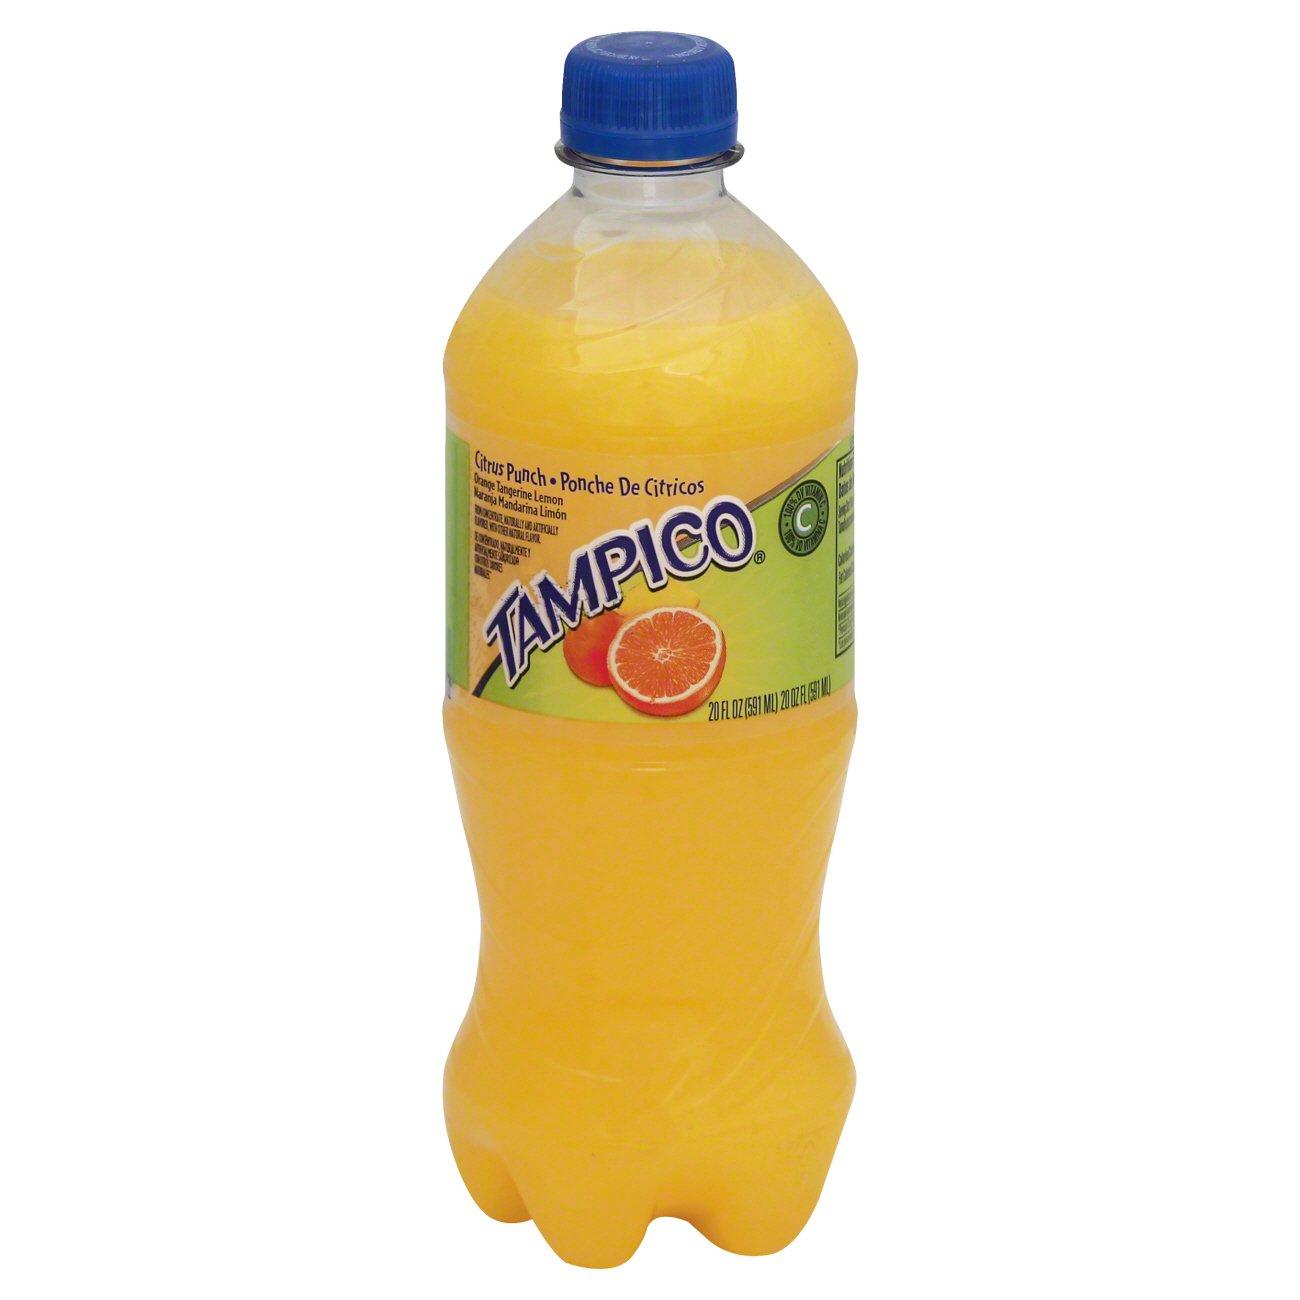 Tampico Orange Tangerine Lemon Citrus